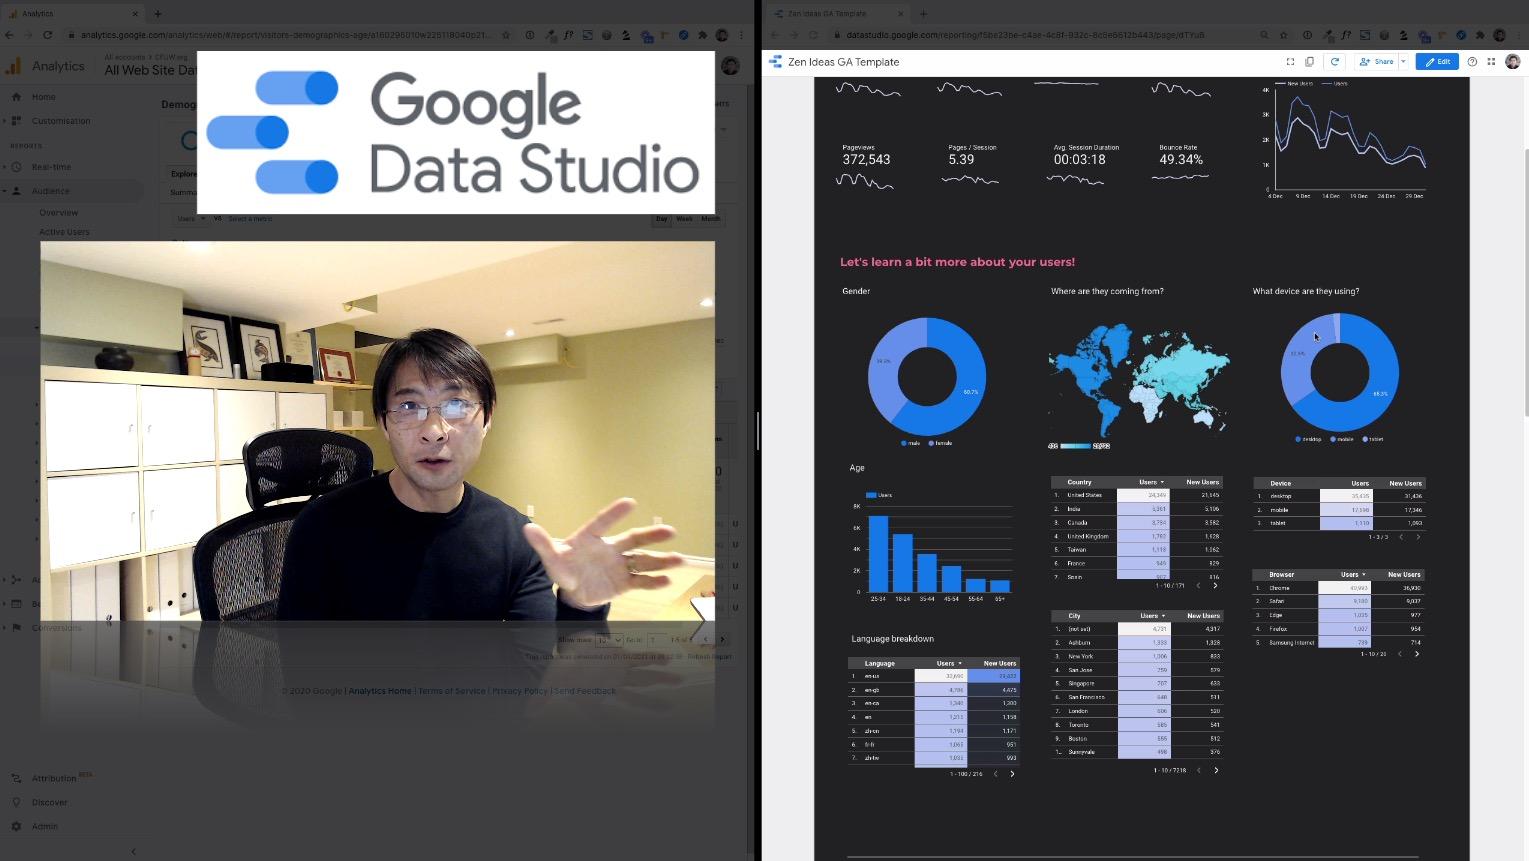 How to customize your Google Analytics data with Google Data Studio